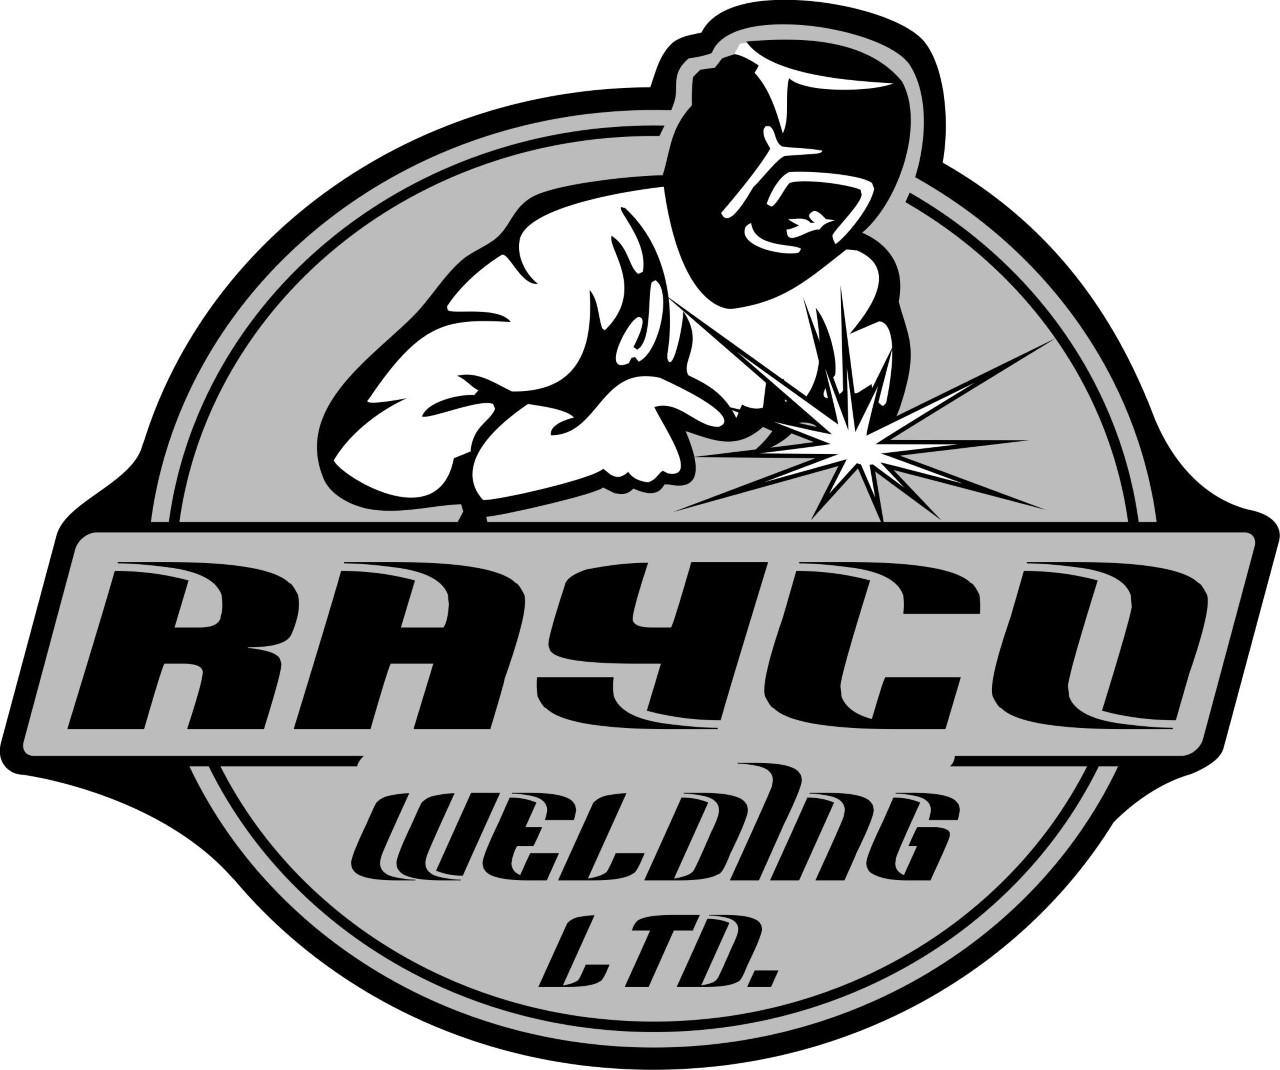 Rayco Welding Ltd.